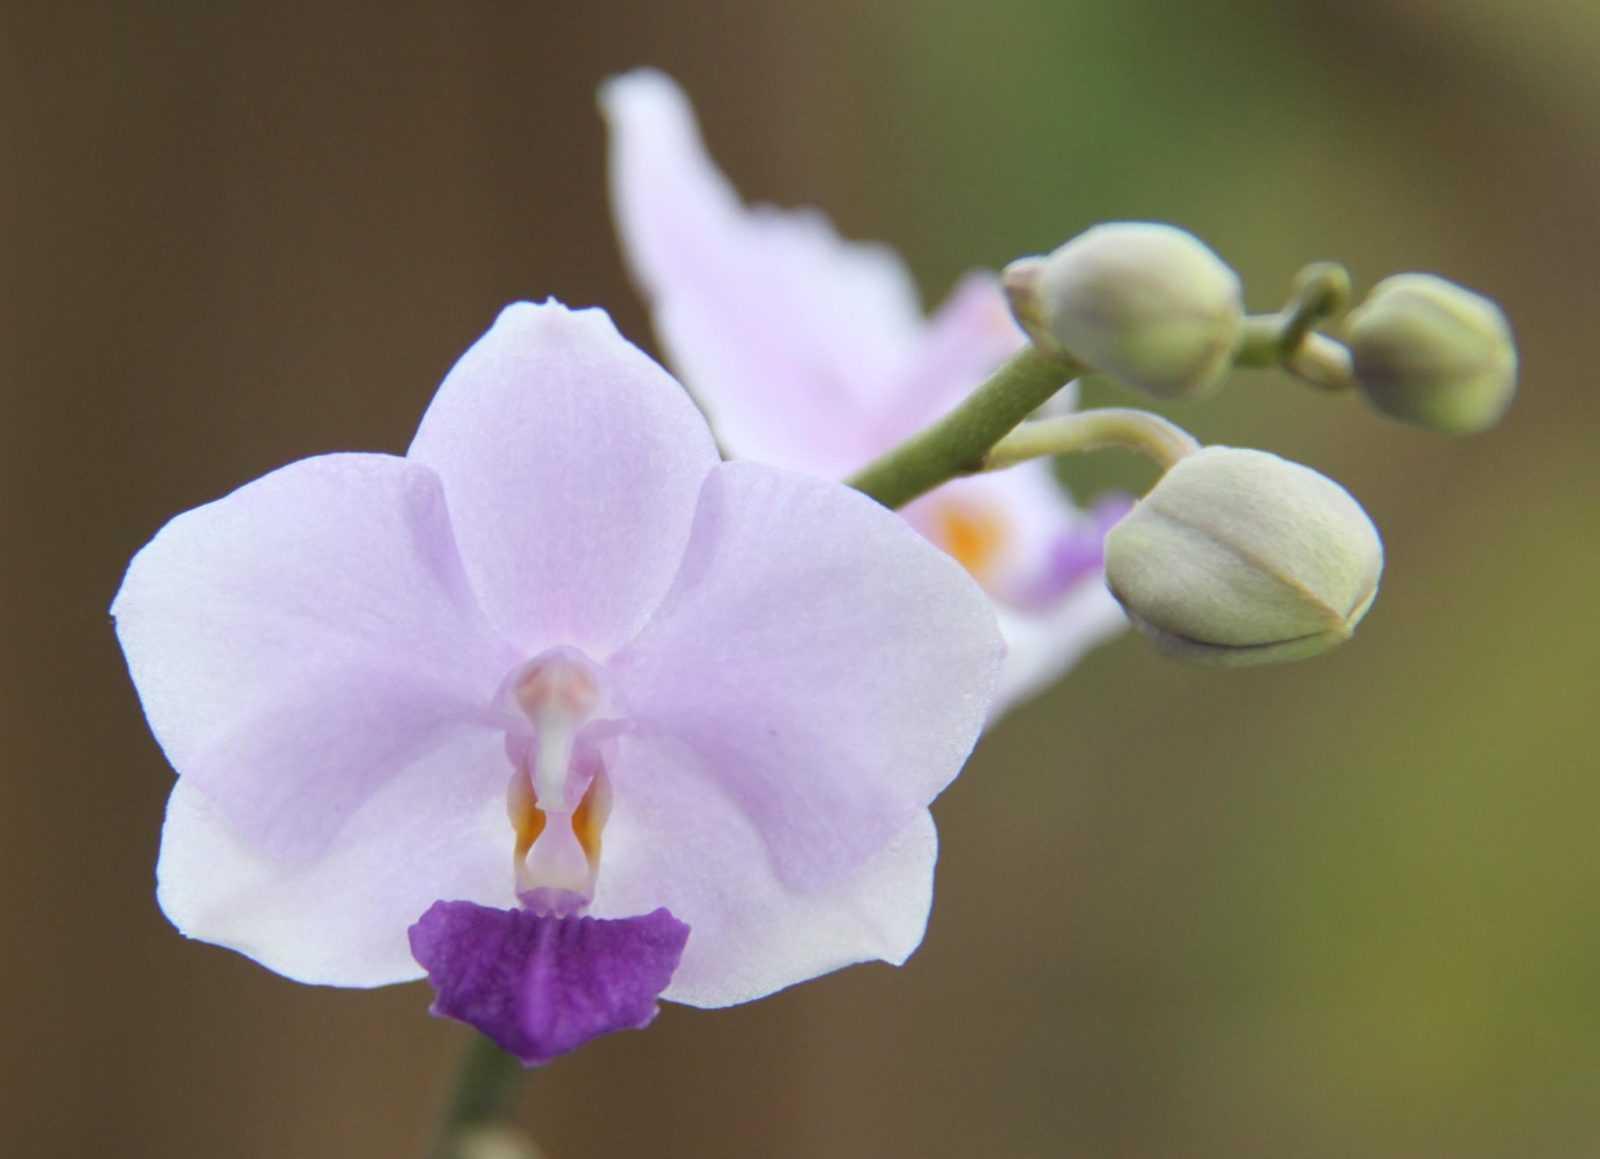 orhideya-falenopsis-foto-video-vidyi-falenopsis-harakteristika-i-opisanie-34